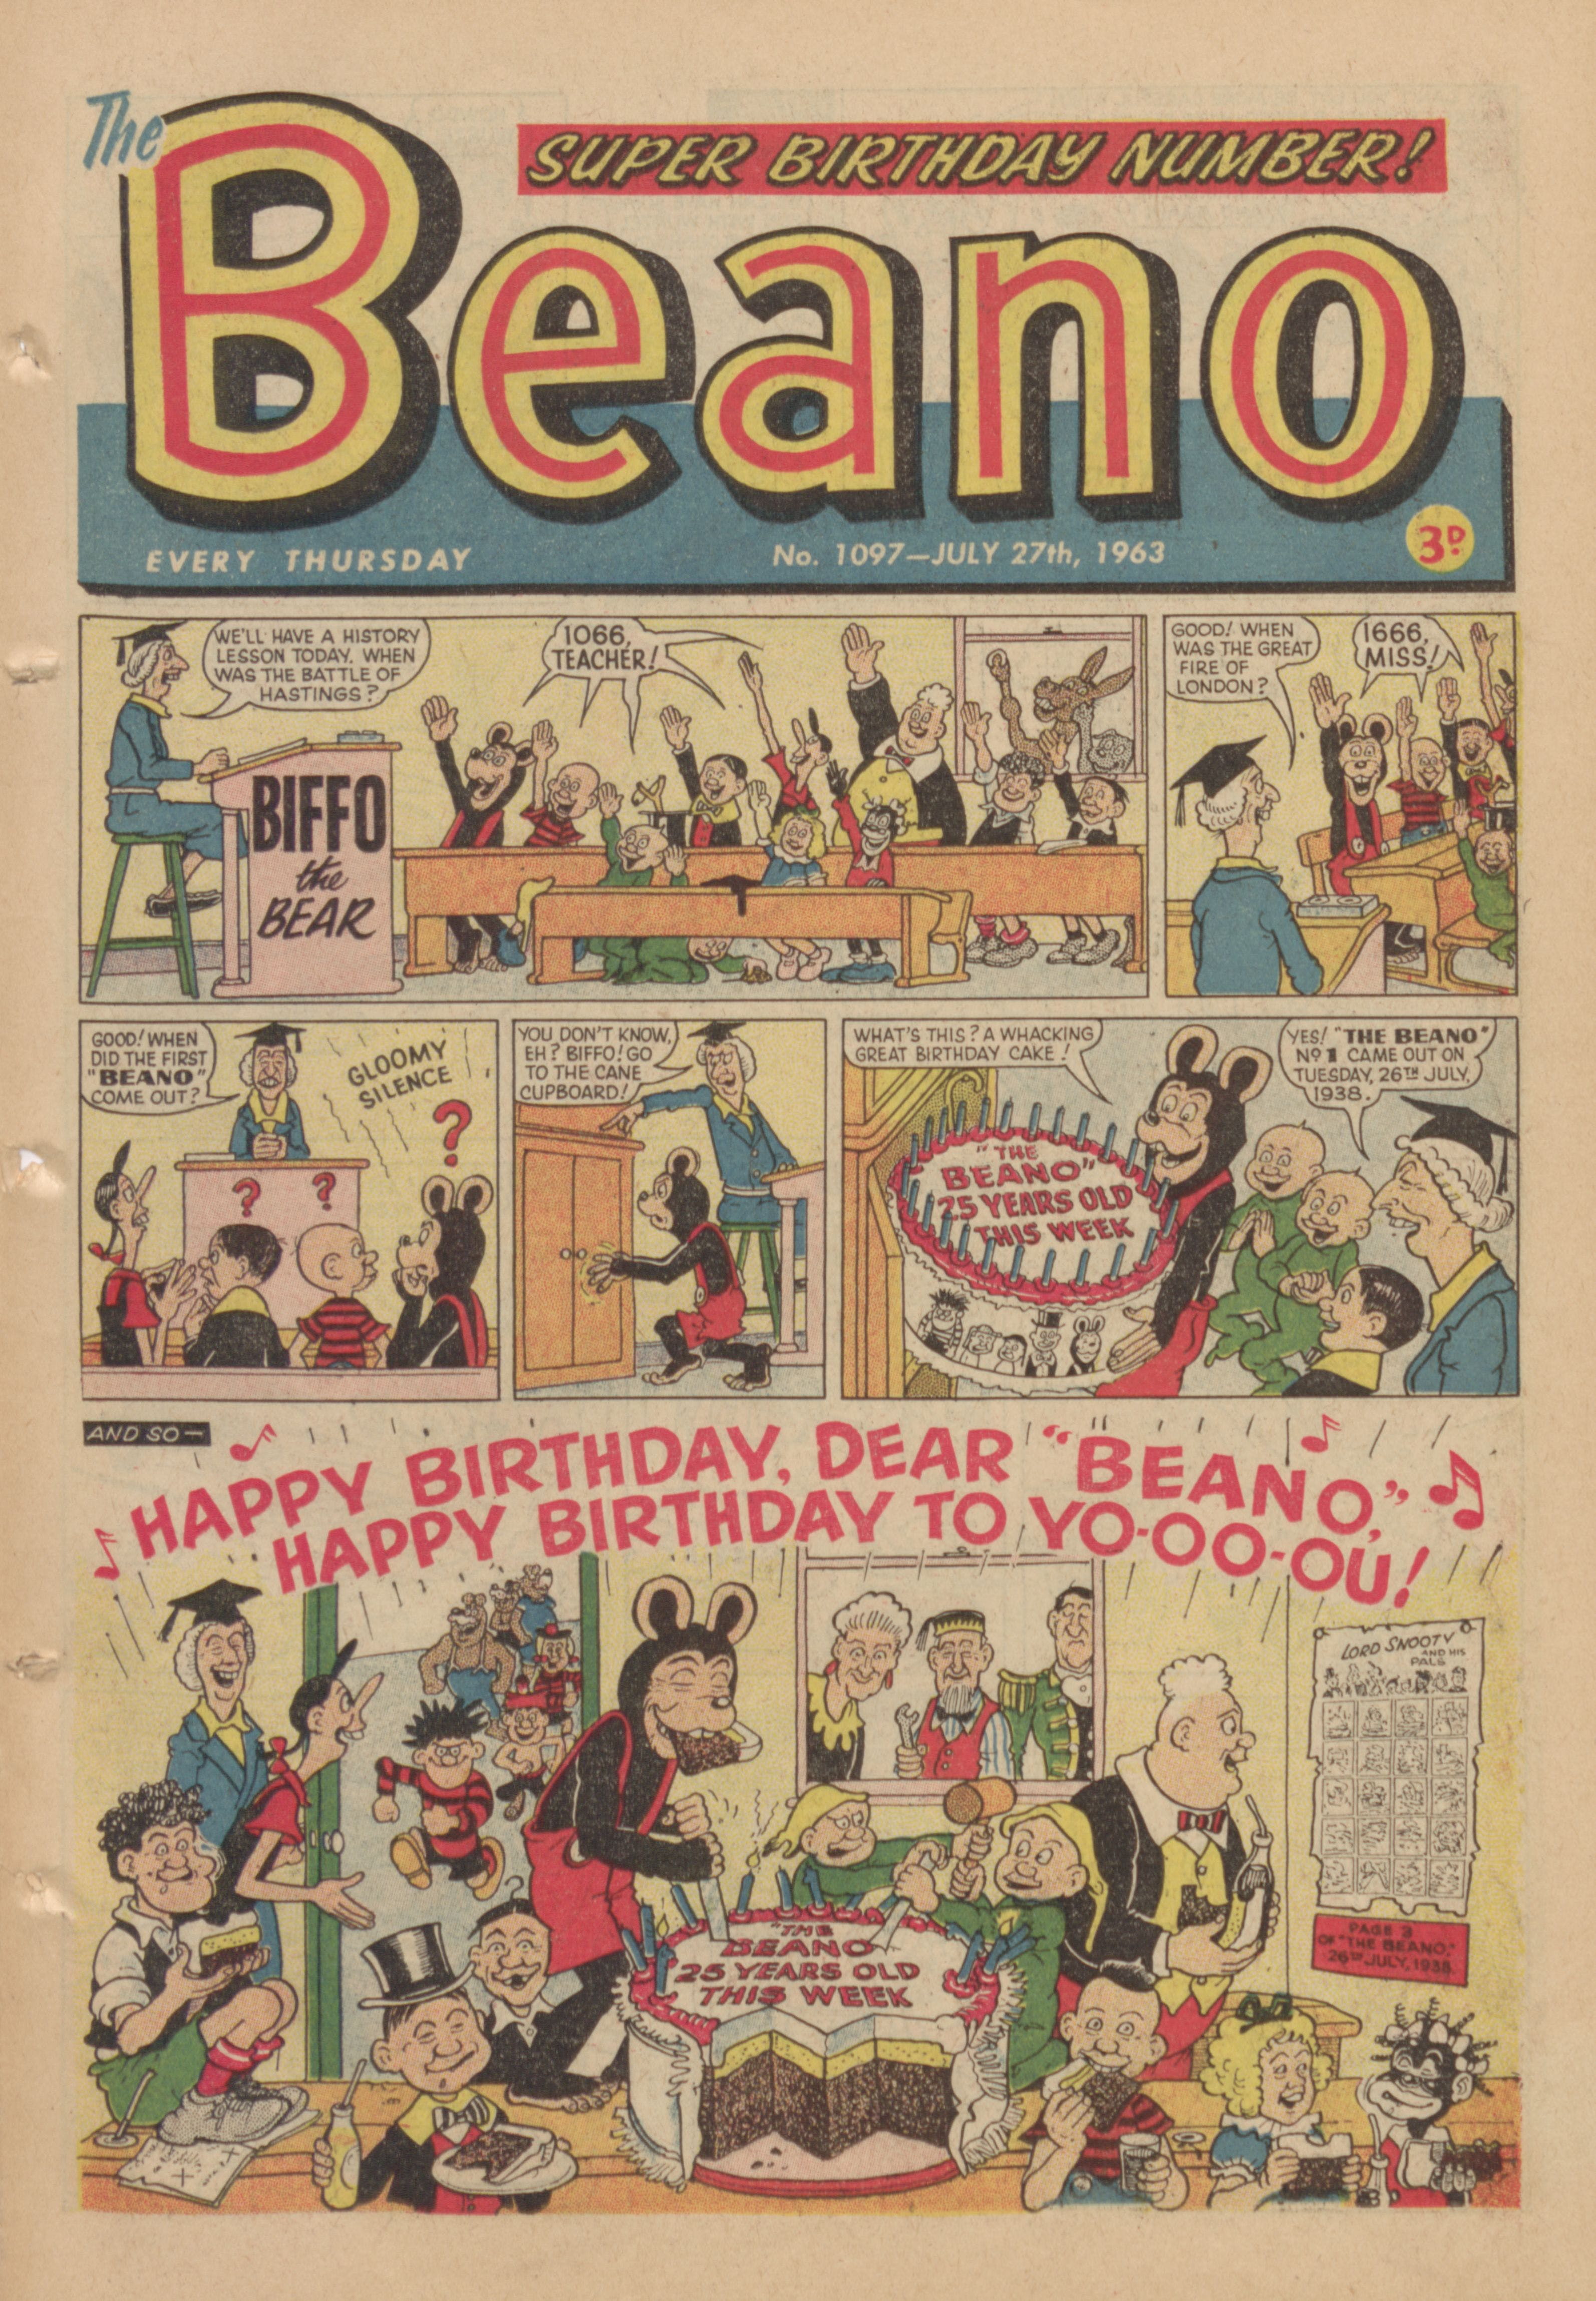 1963 beano cover